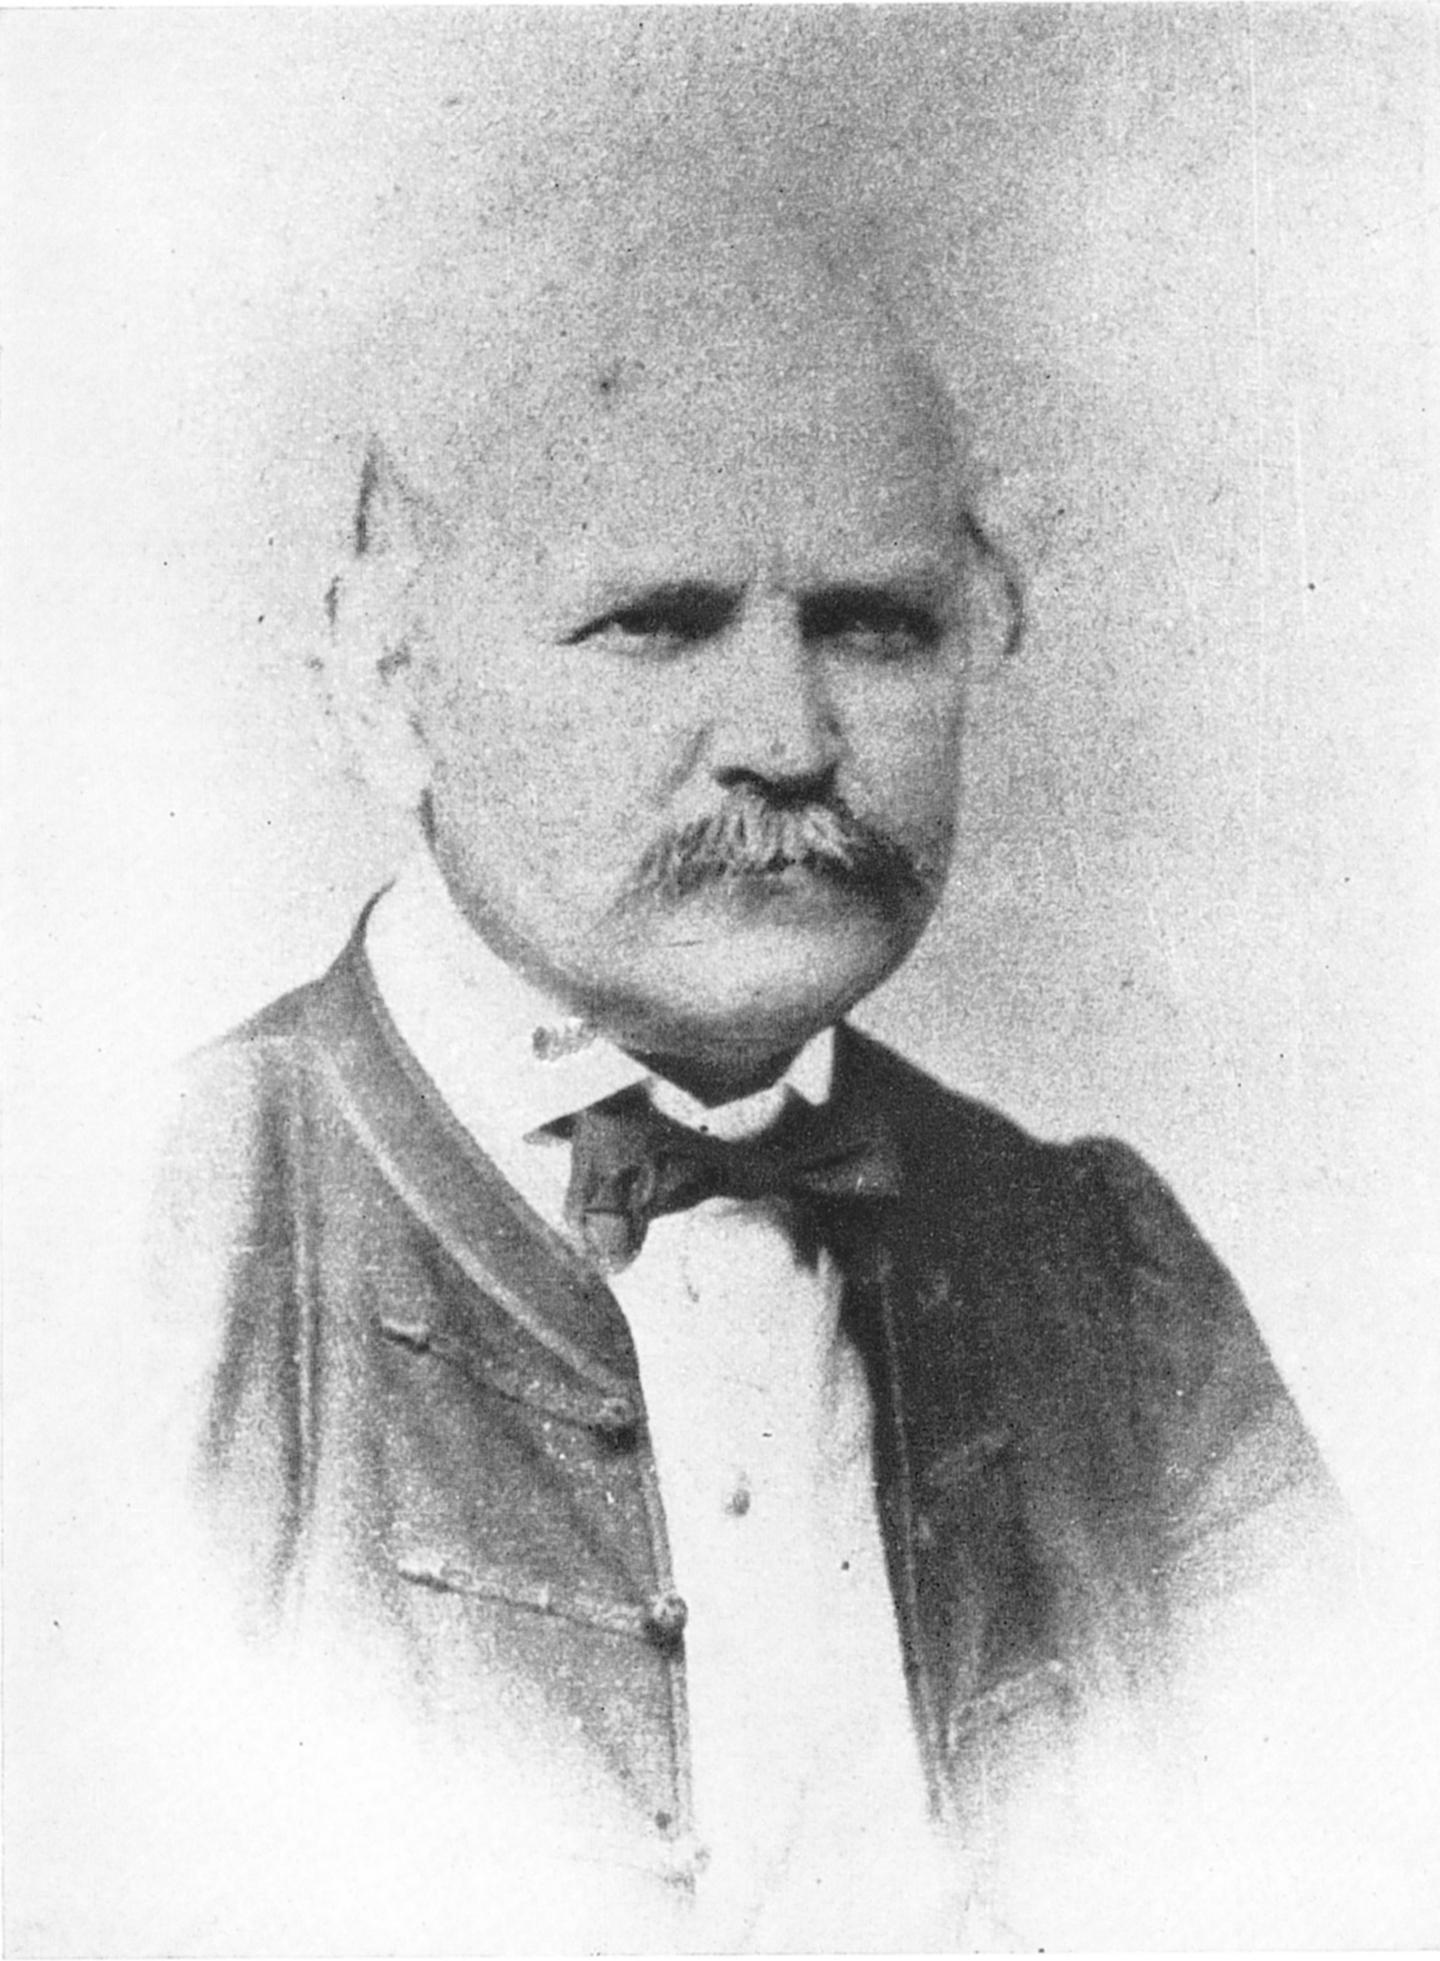 Ignaz_Semmelweis_1861